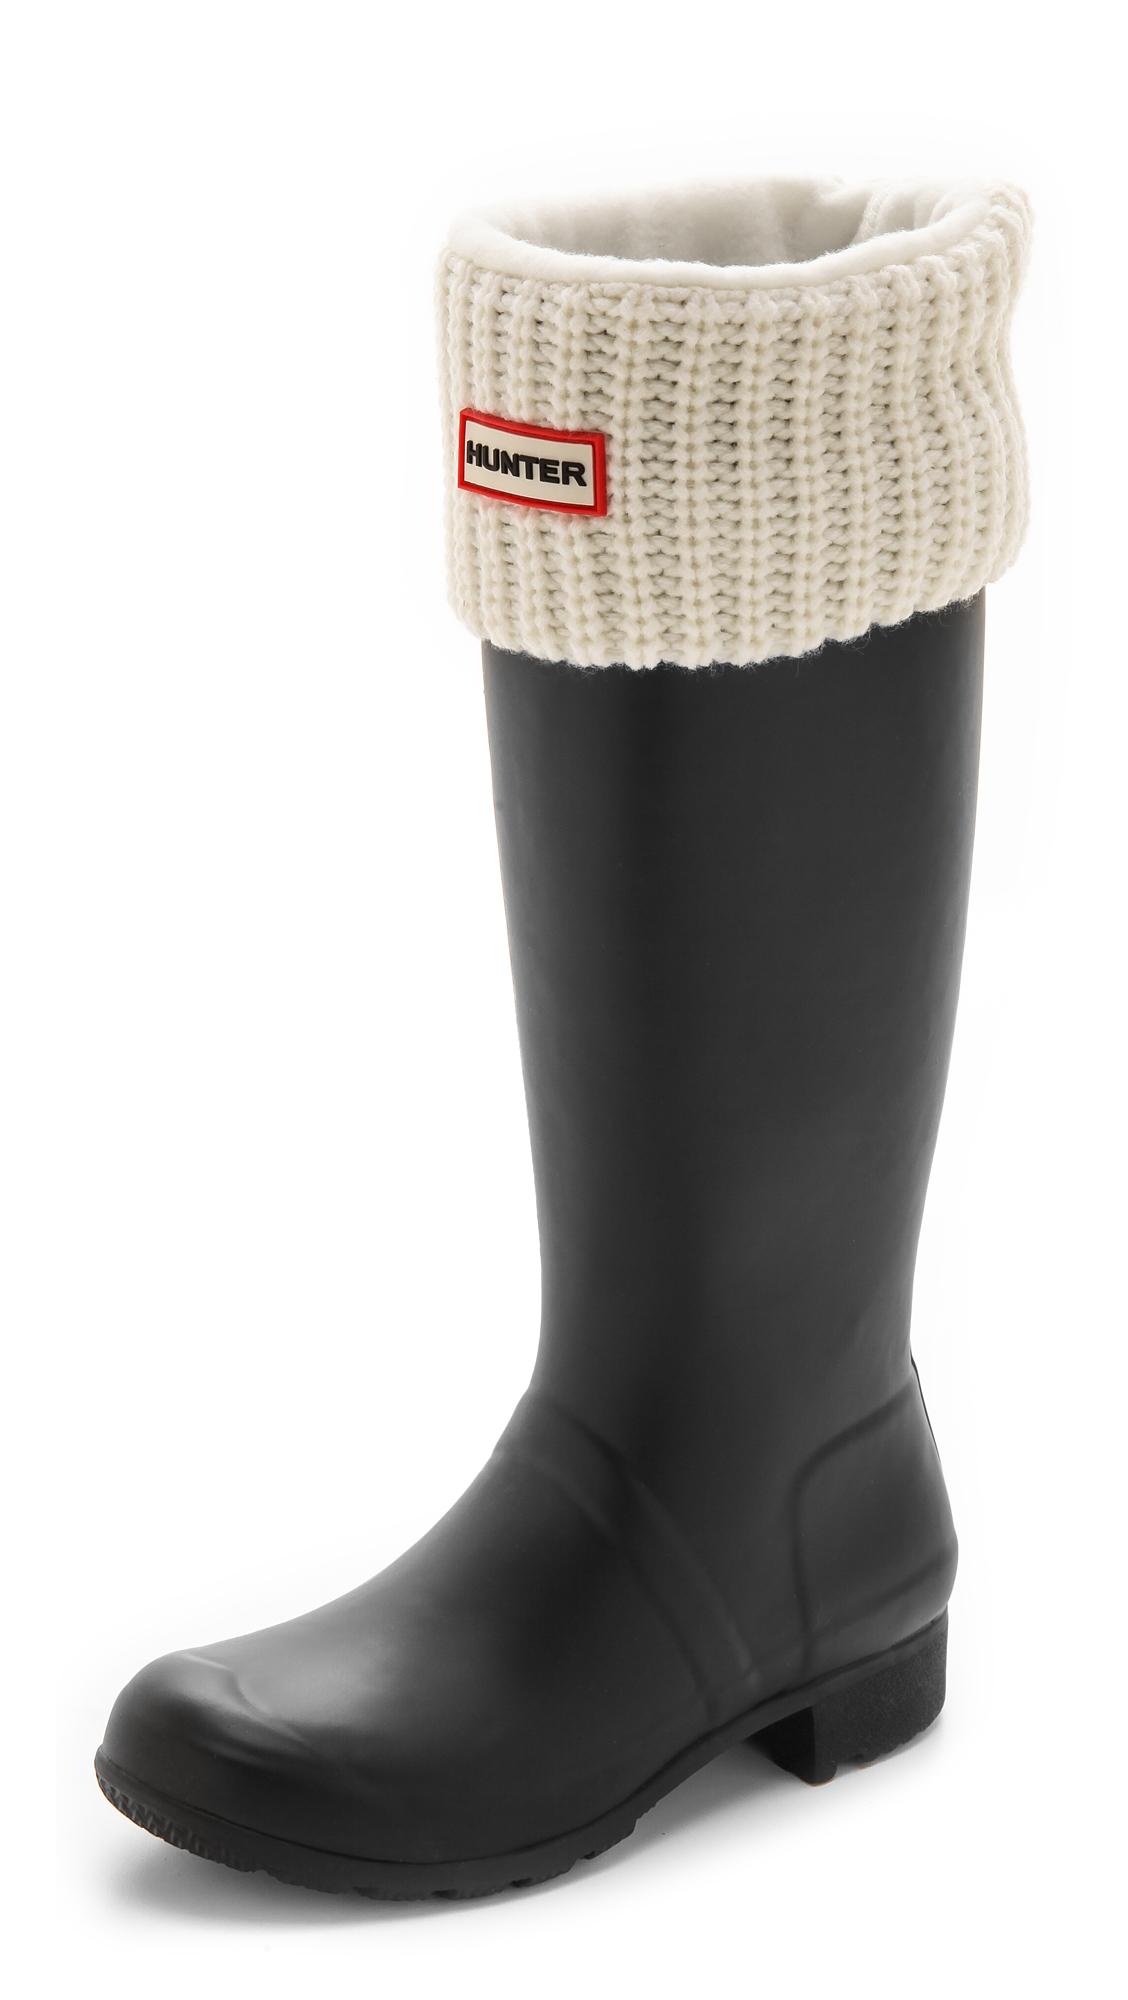 stable quality durable service sold worldwide HUNTER White Half Cardigan Boot Socks - Slate